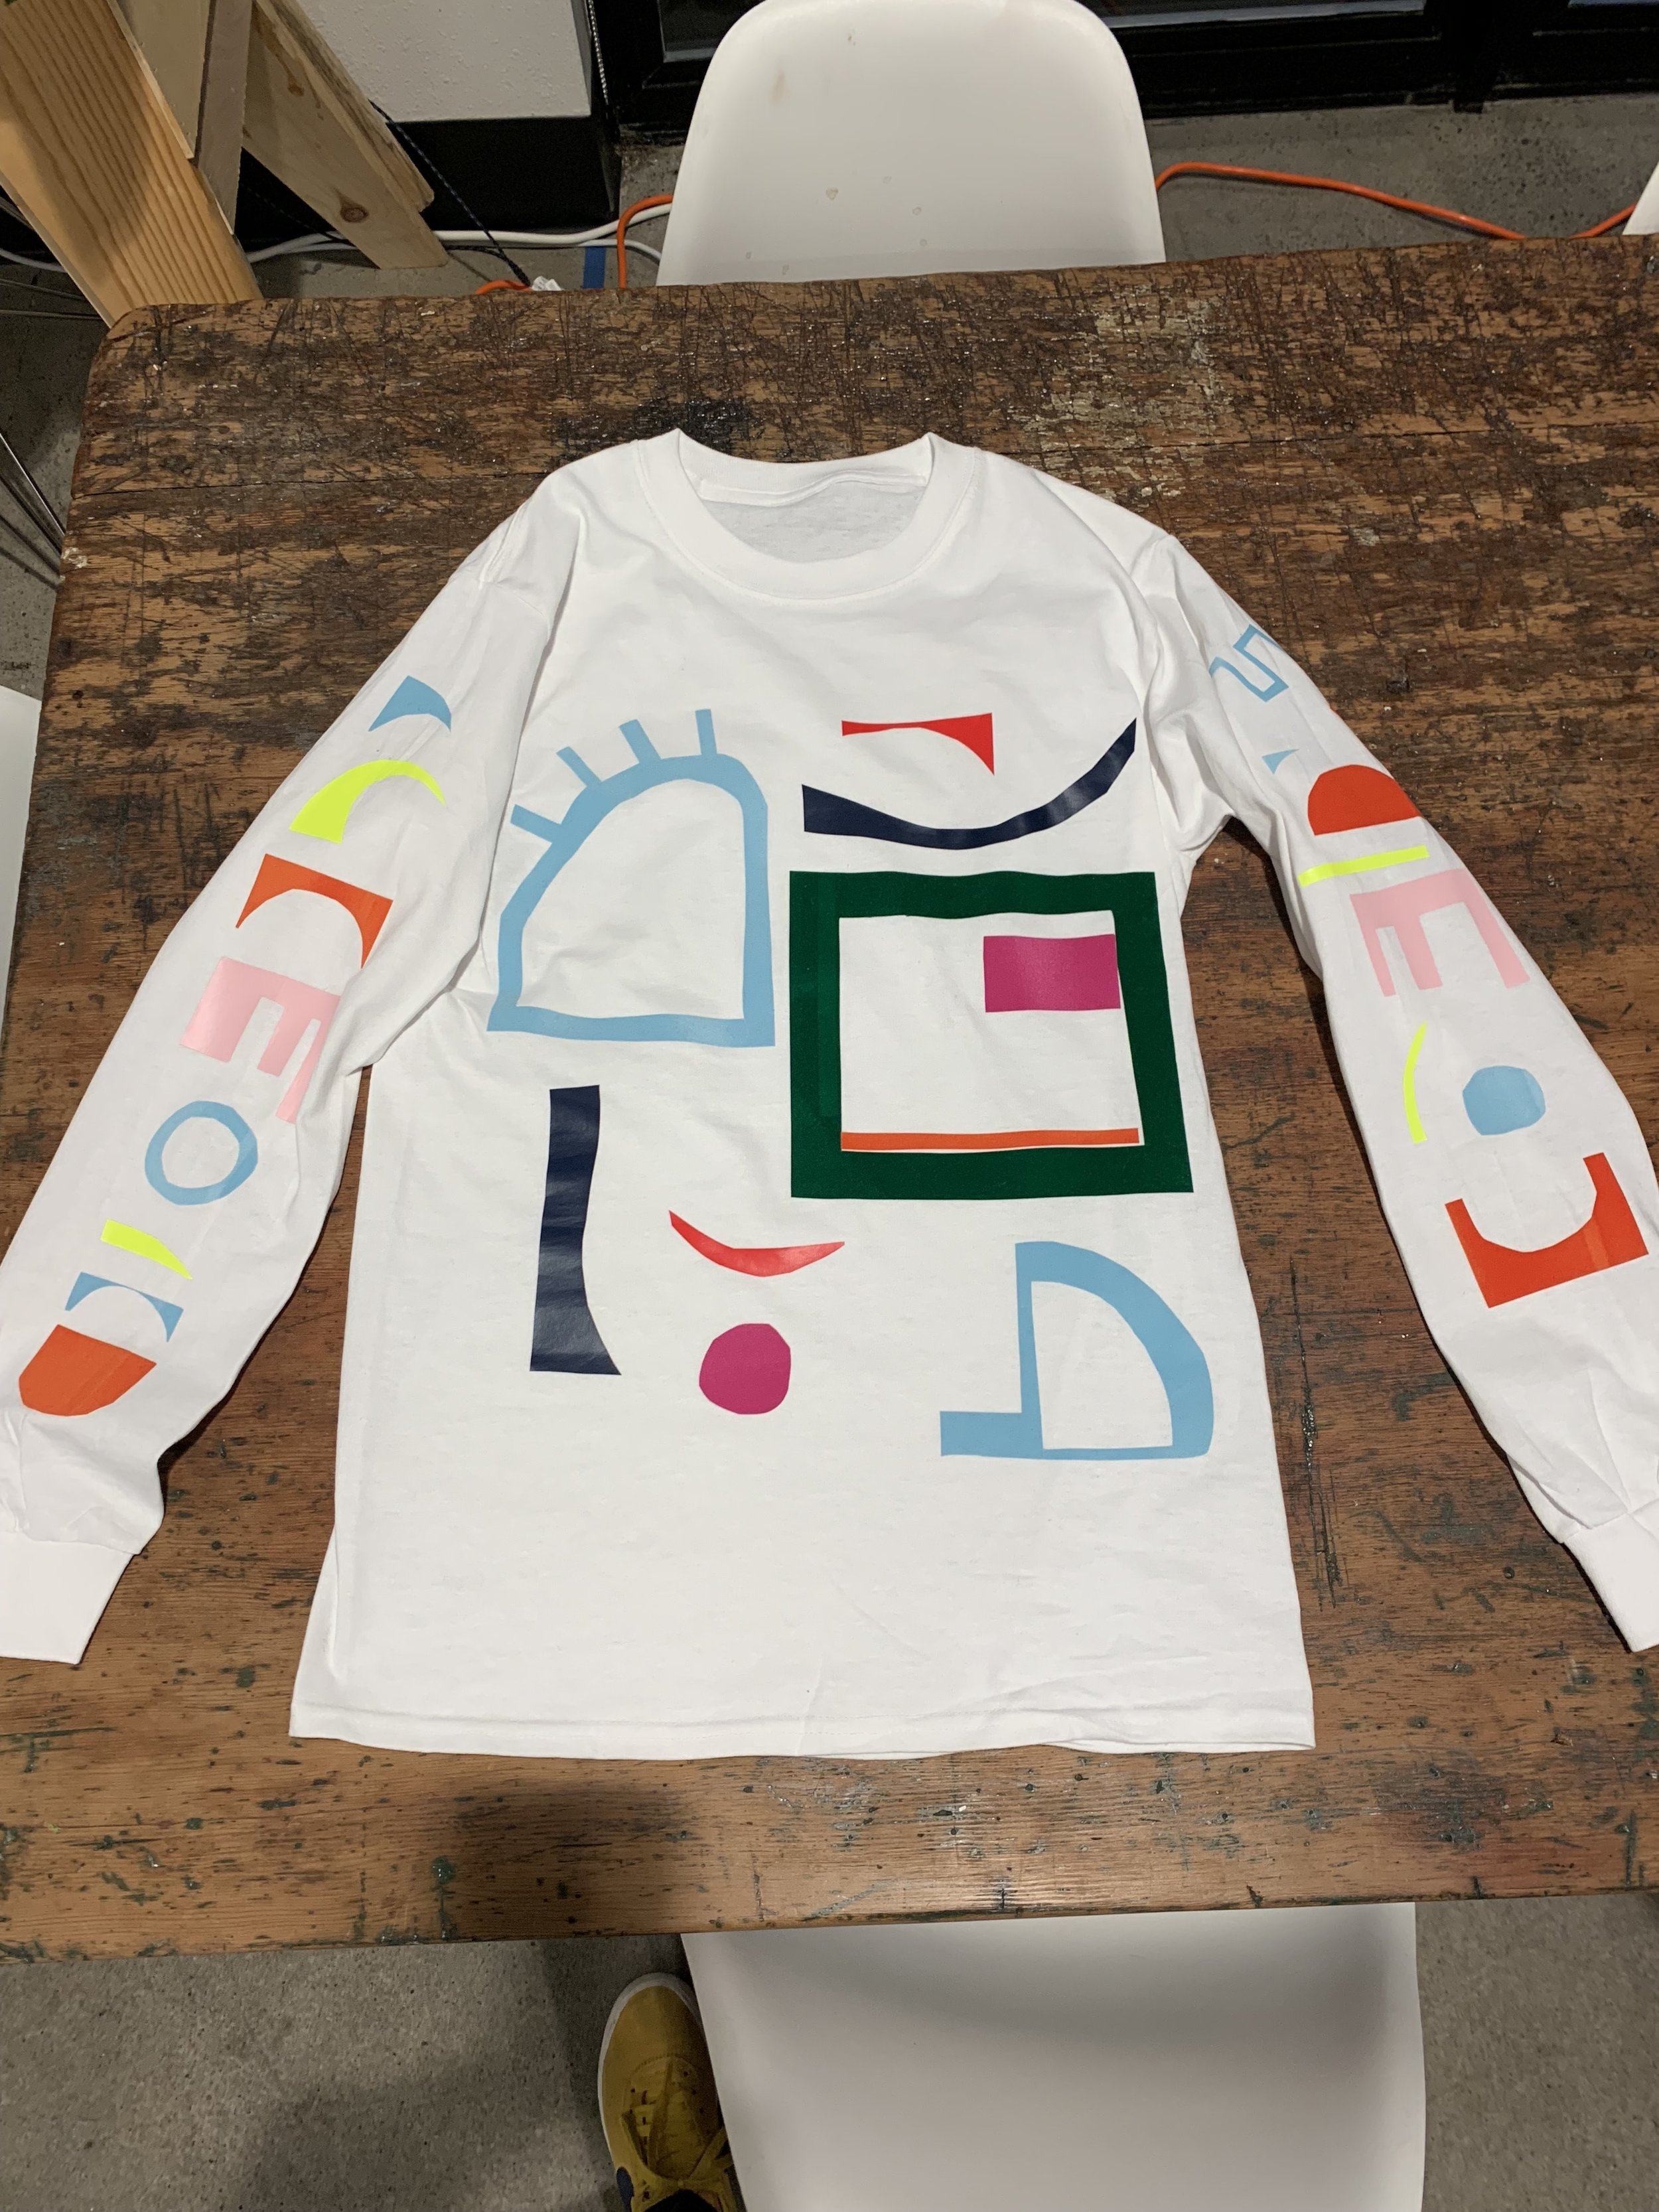 Abstract_shirt.JPG